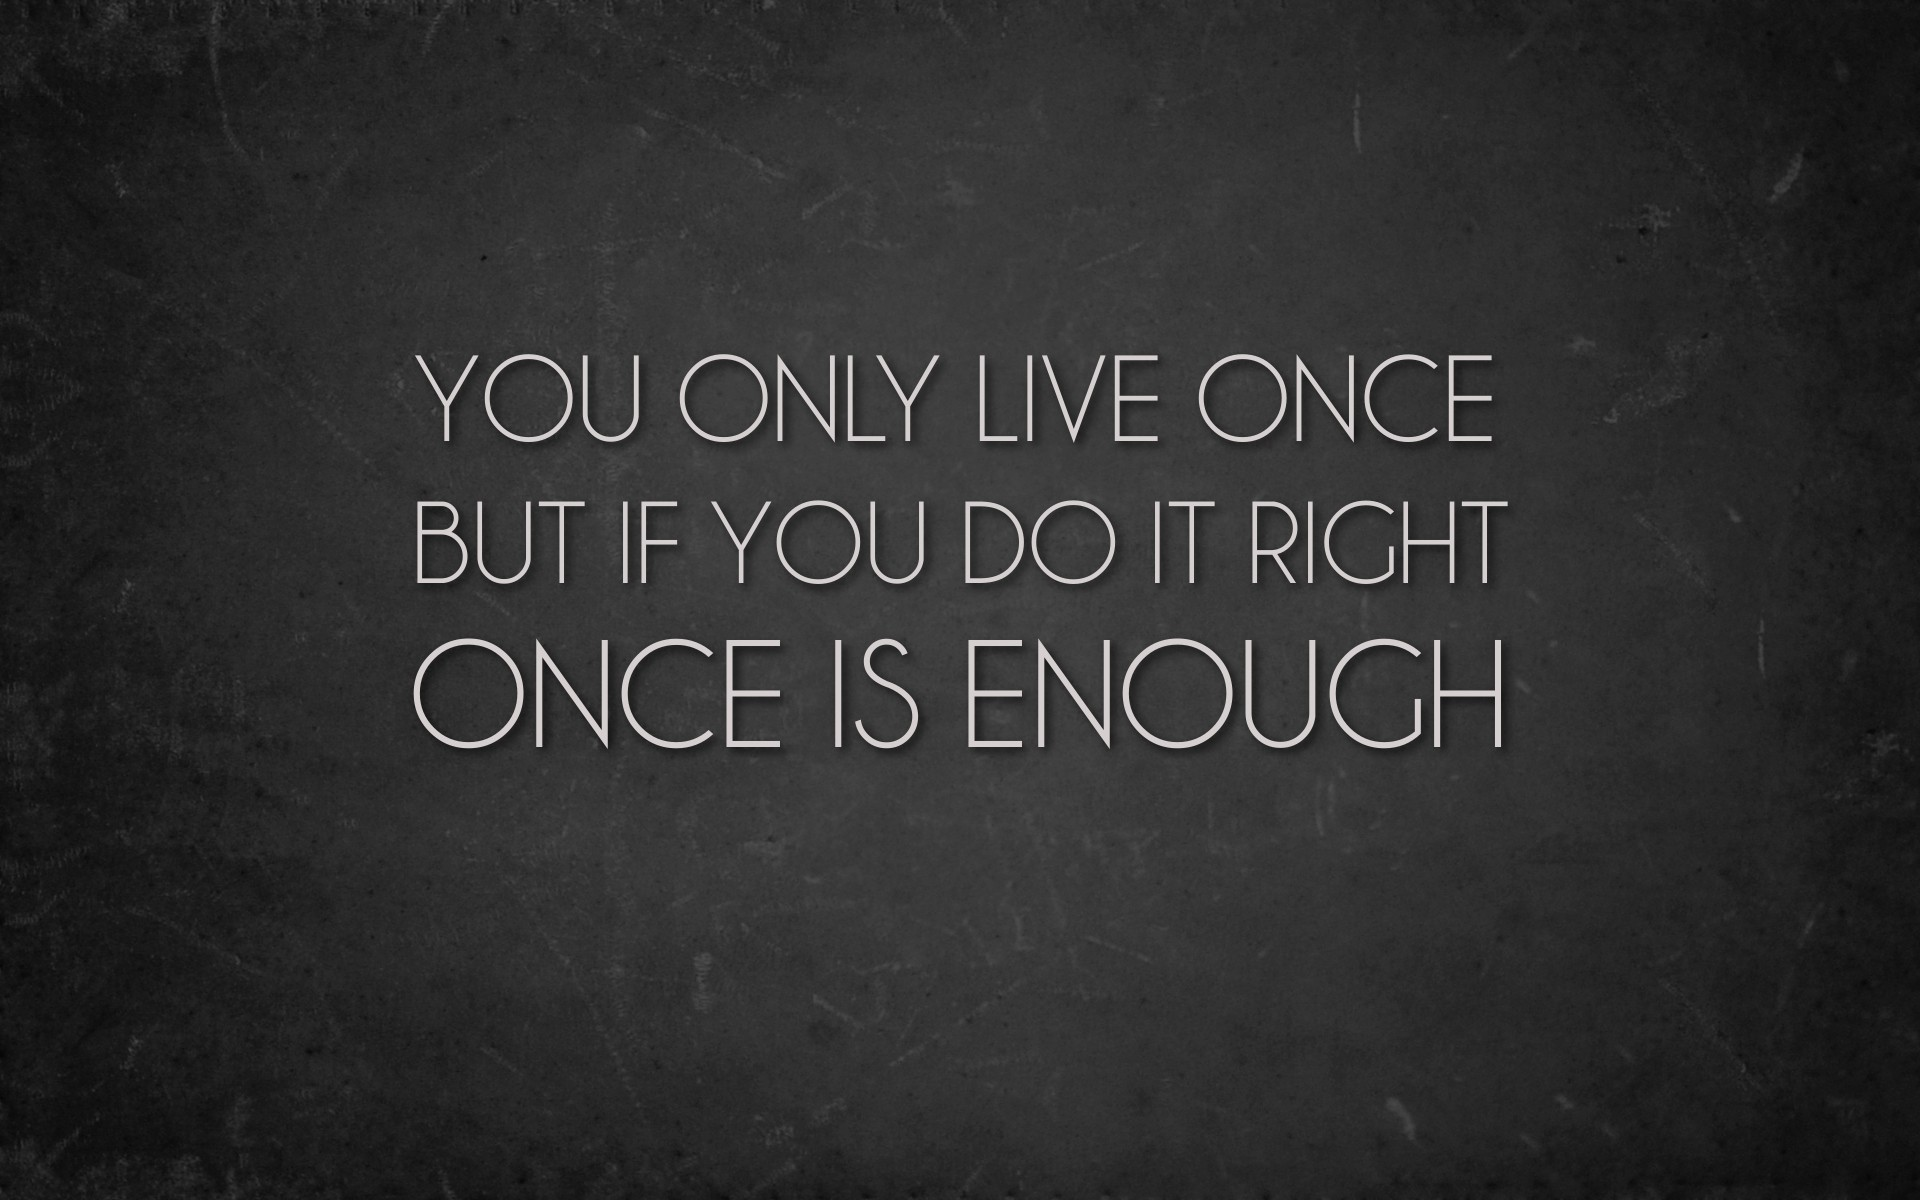 Inspirational Motivational Life Quotes QuotesGram 1920x1200